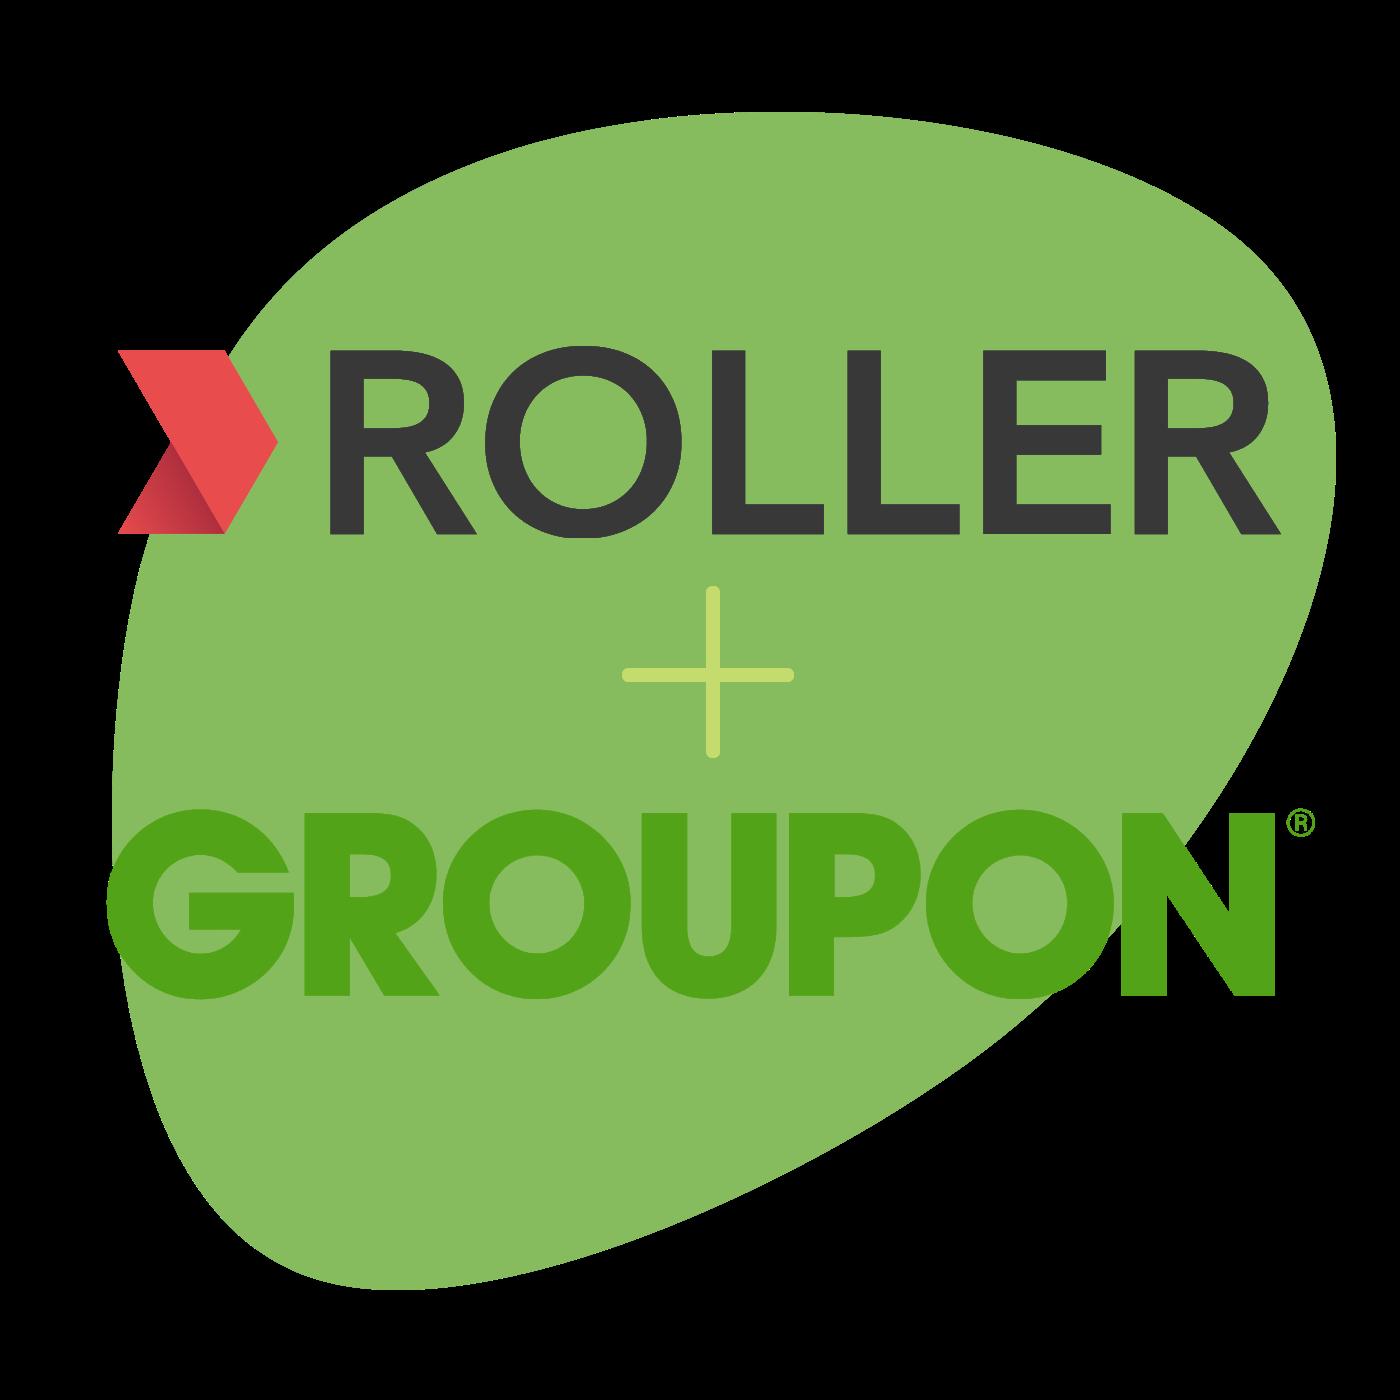 groupon & roller1